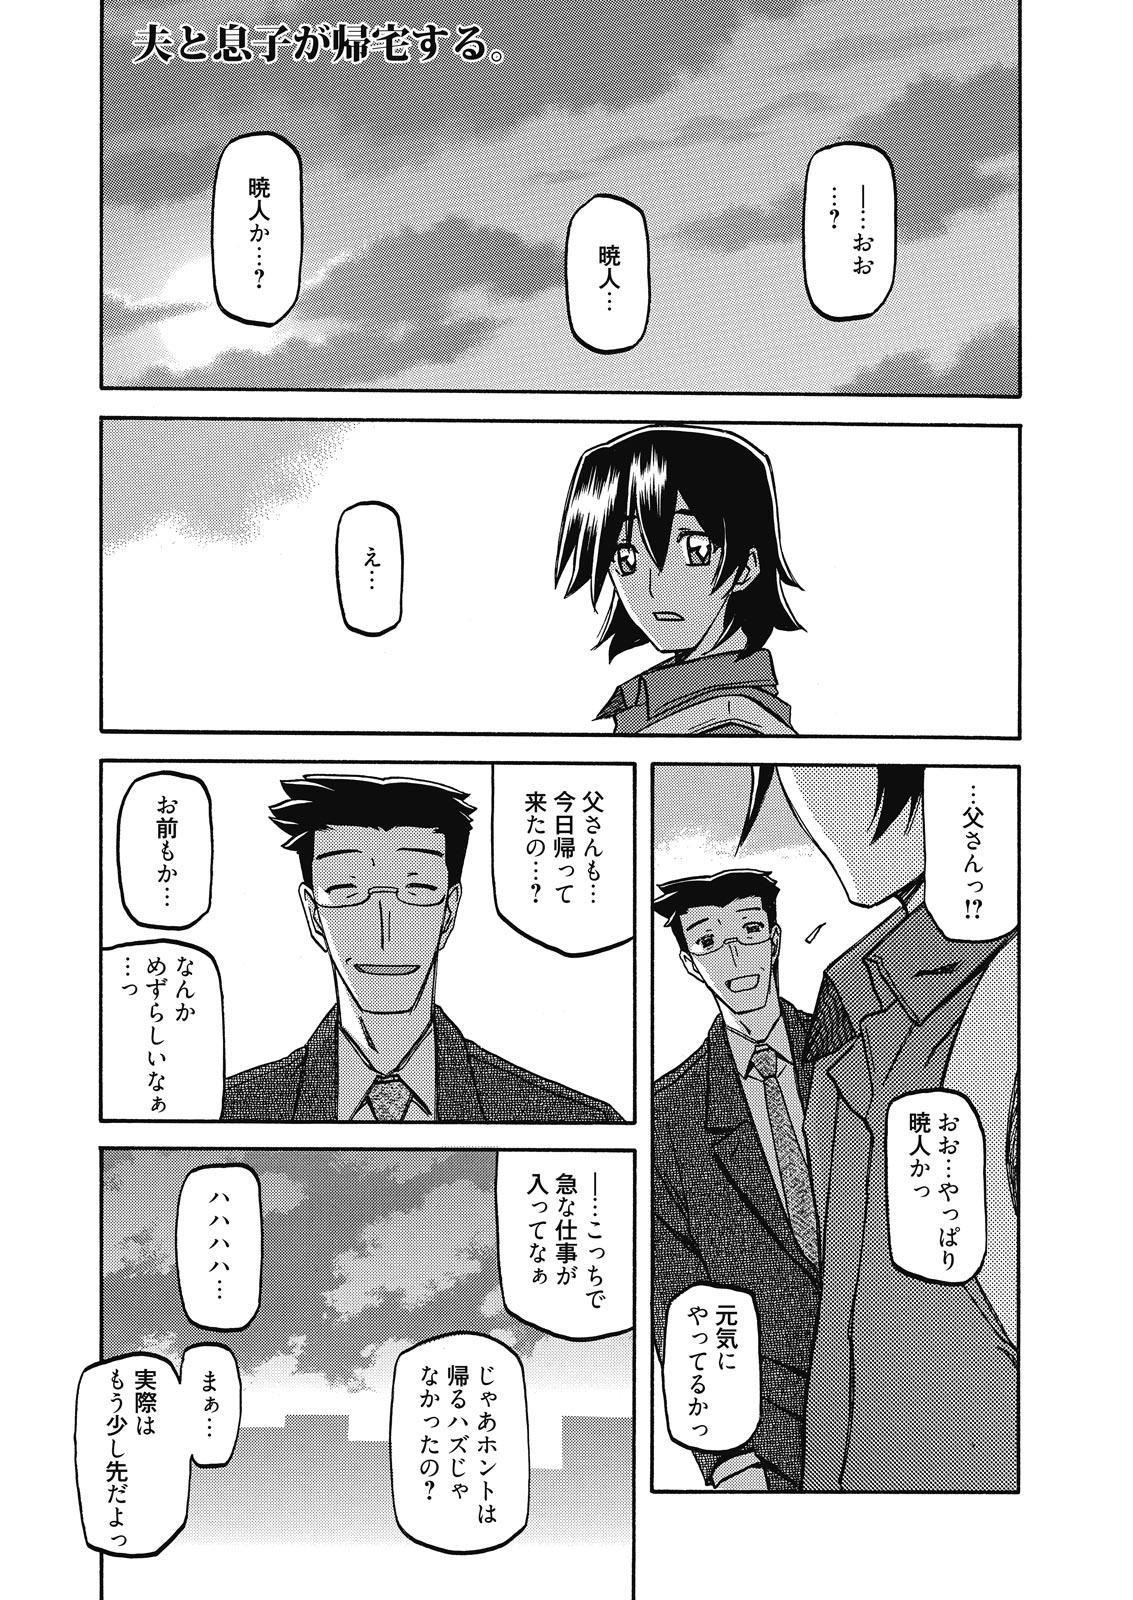 Web Manga Bangaichi Vol. 7 46